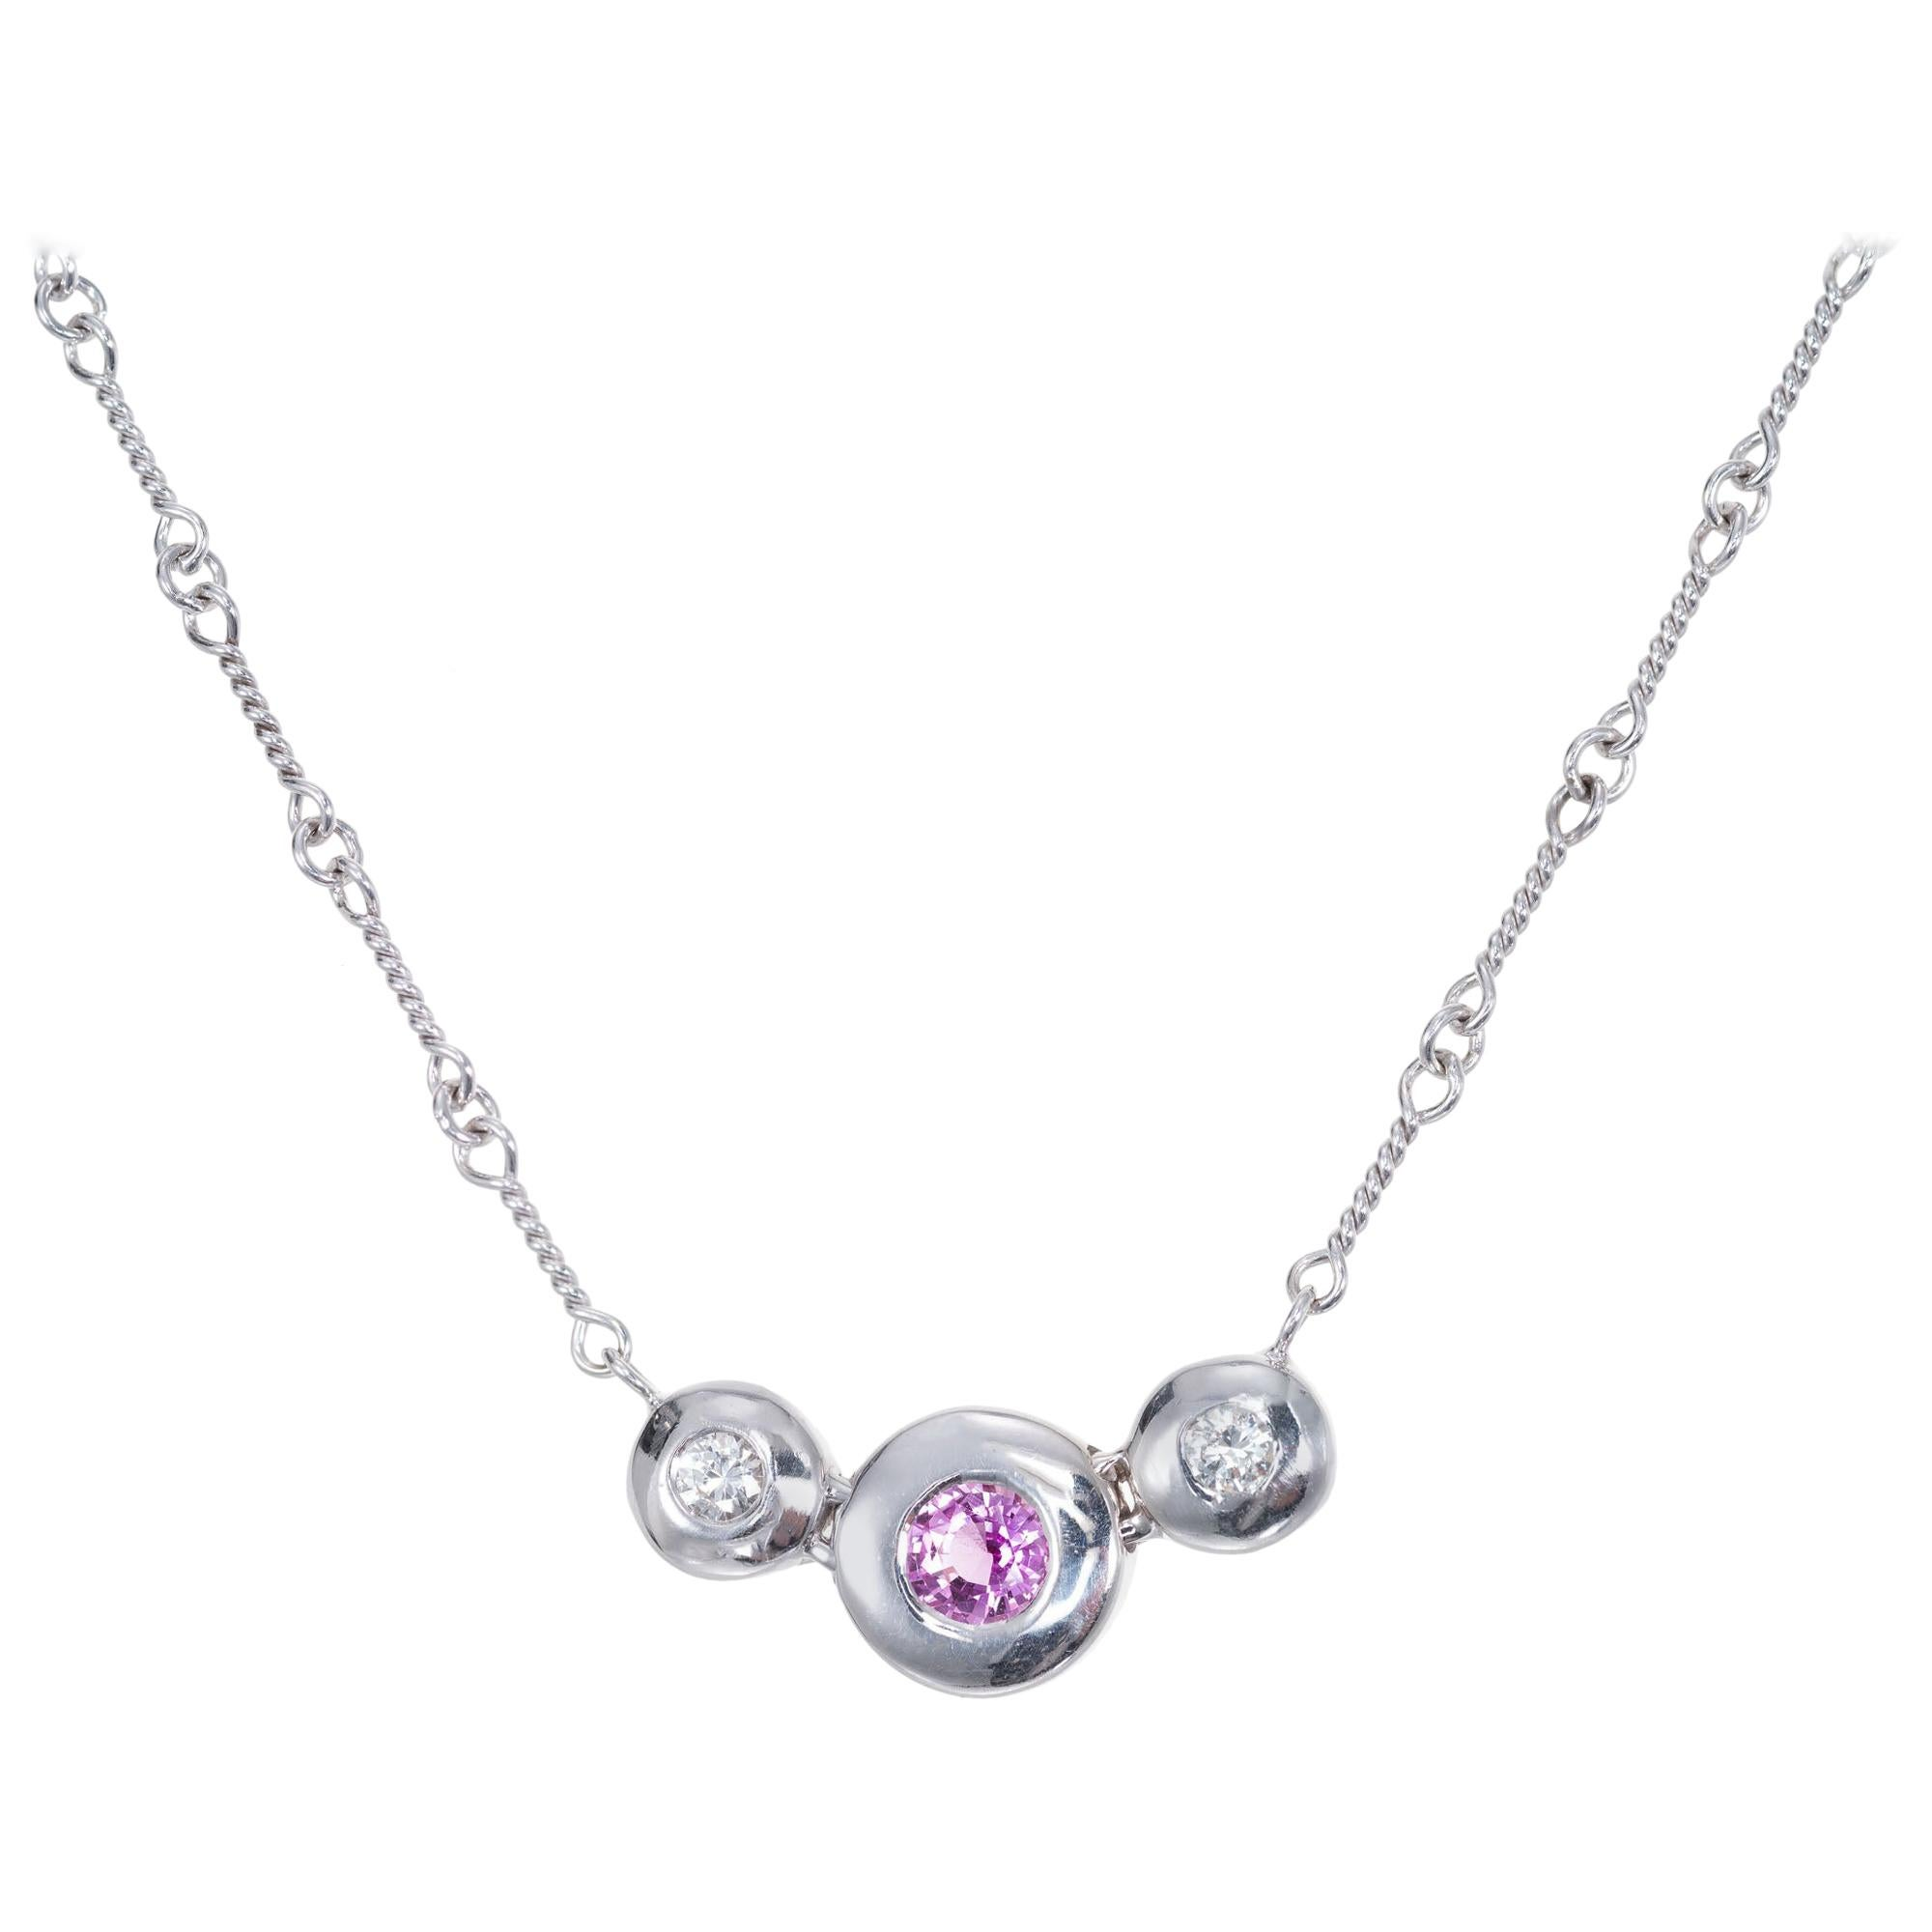 .35 Carat Pink Sapphire Diamond White Gold Link Chain Pendant Necklace